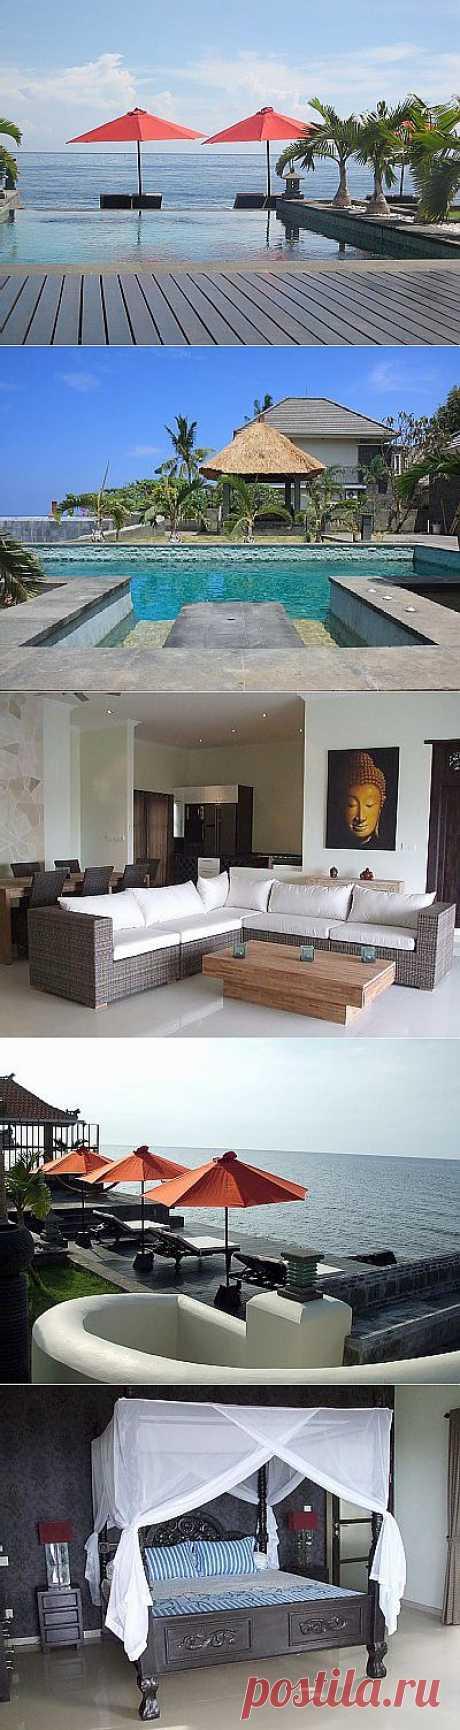 МИР ВАМ - Аренда виллы на Бали